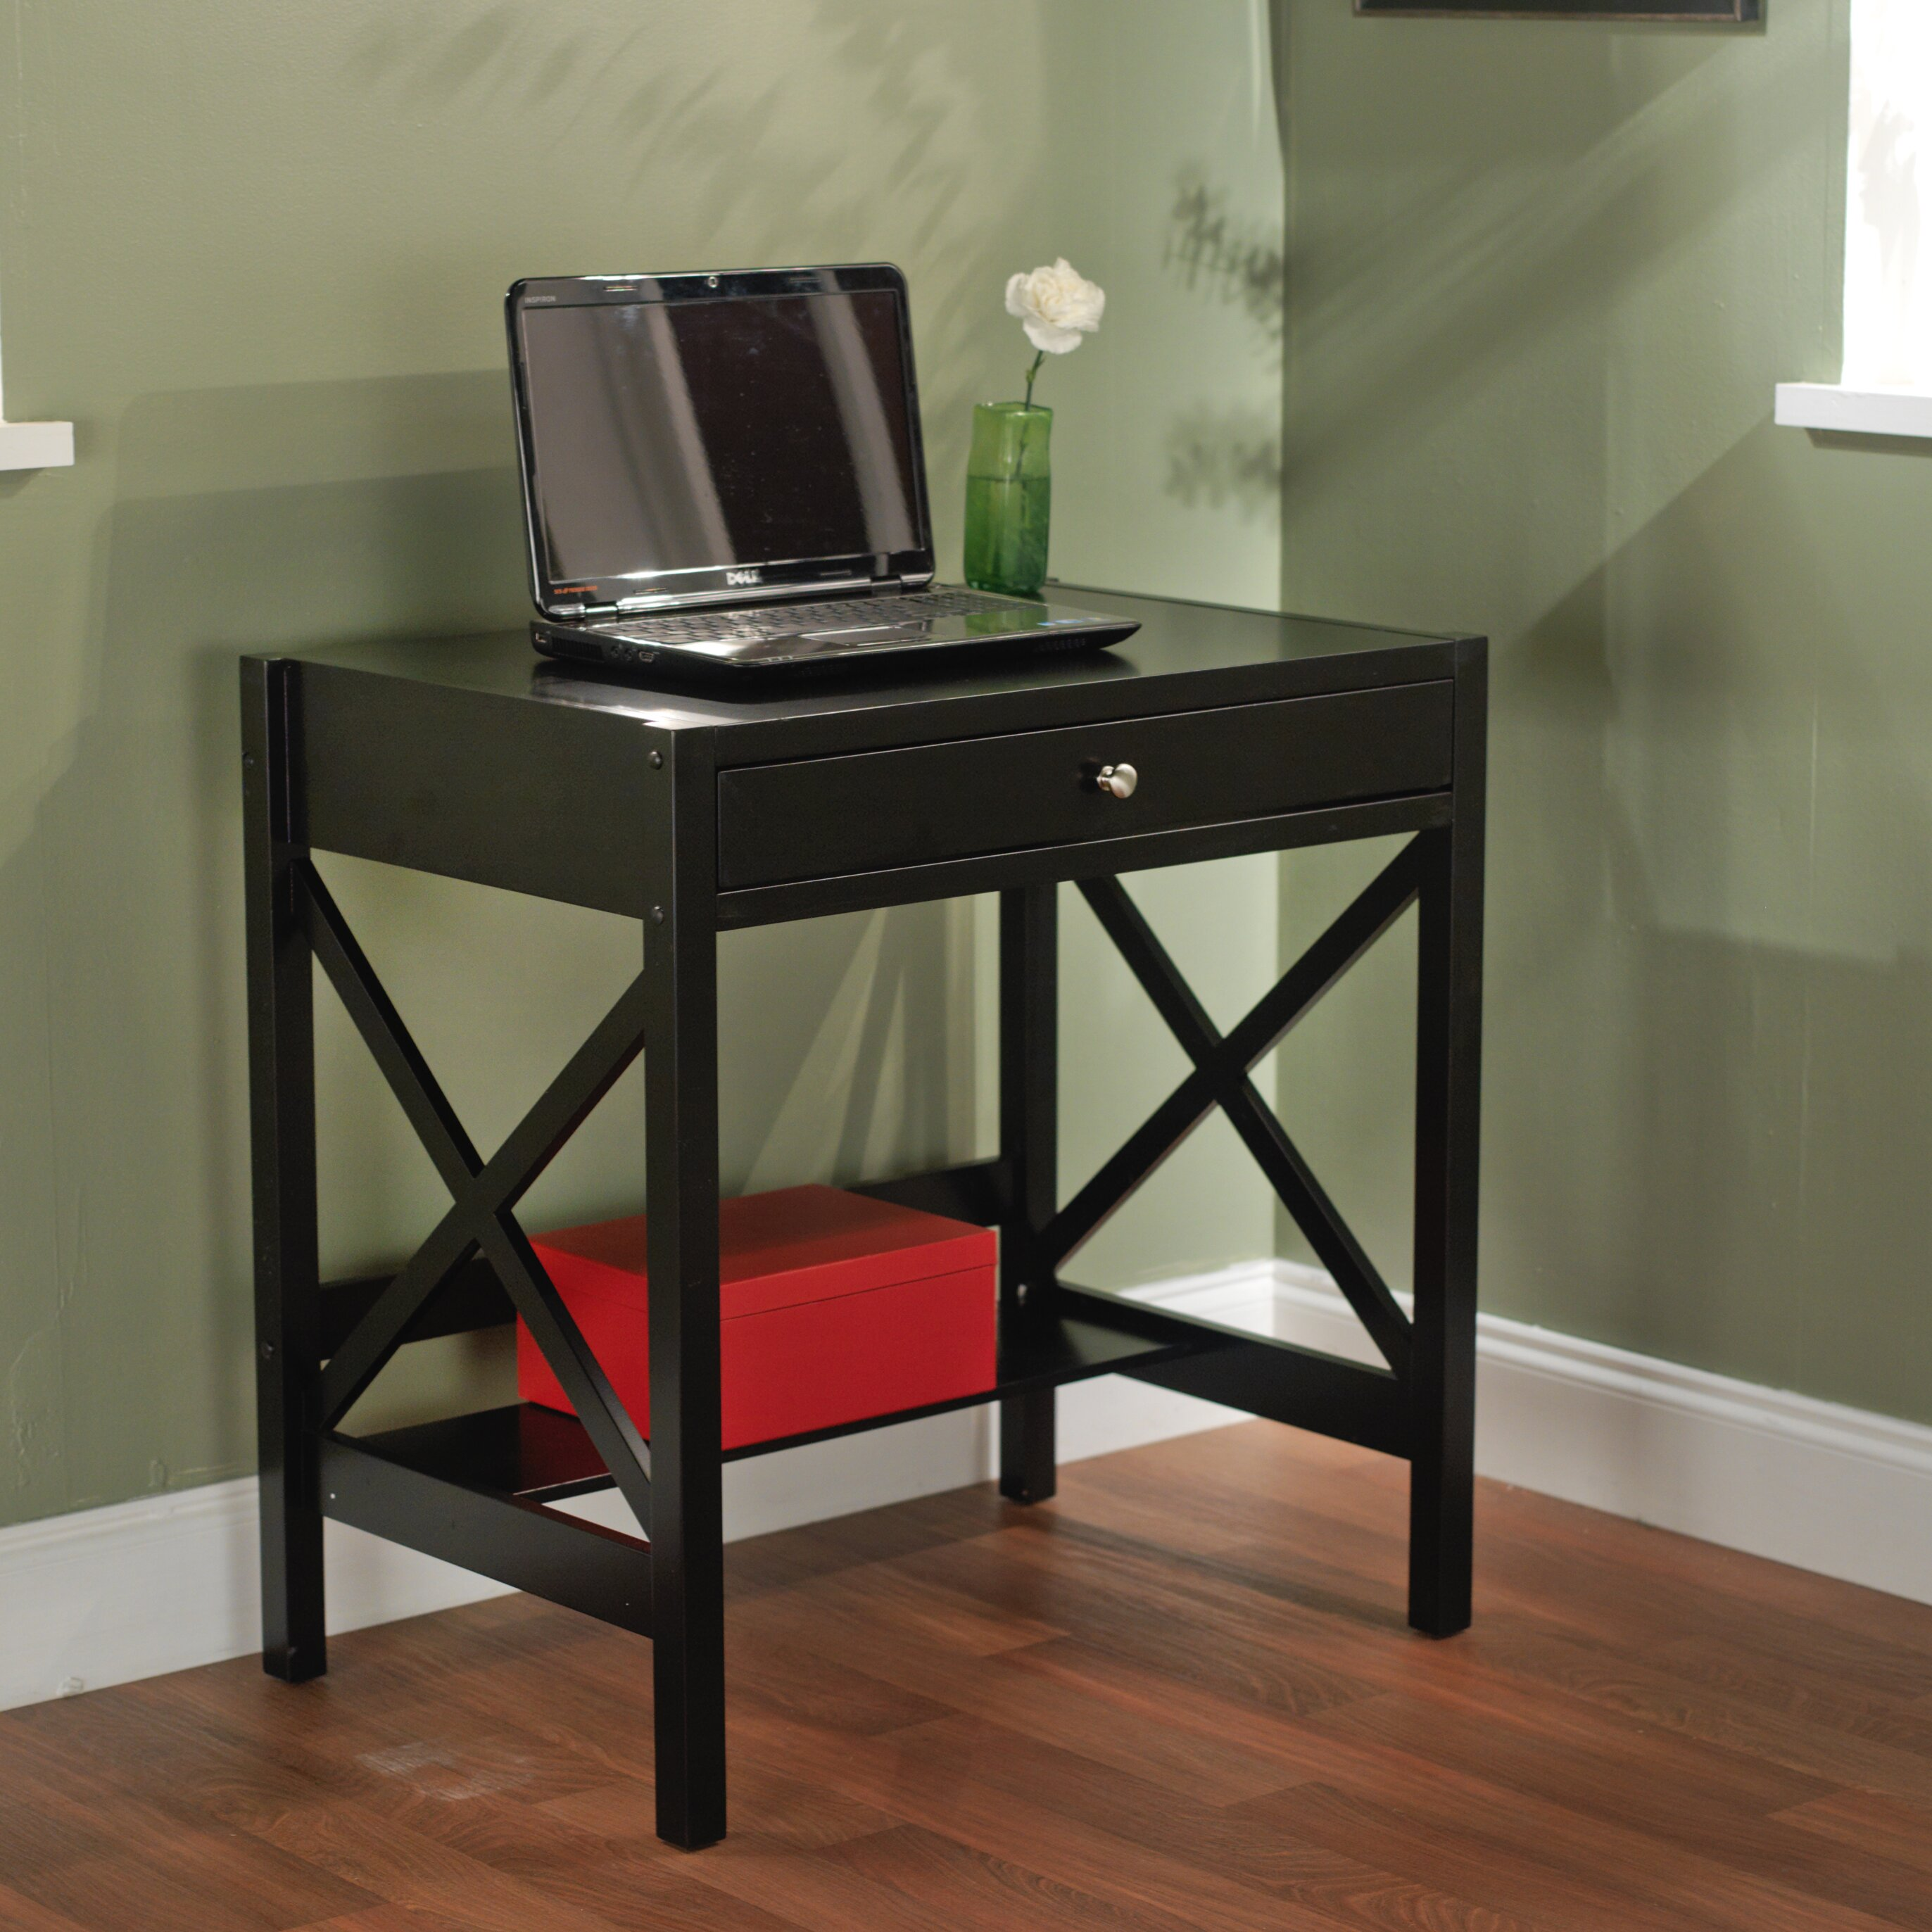 charlton home chad 1 drawer writing desk reviews wayfair. Black Bedroom Furniture Sets. Home Design Ideas